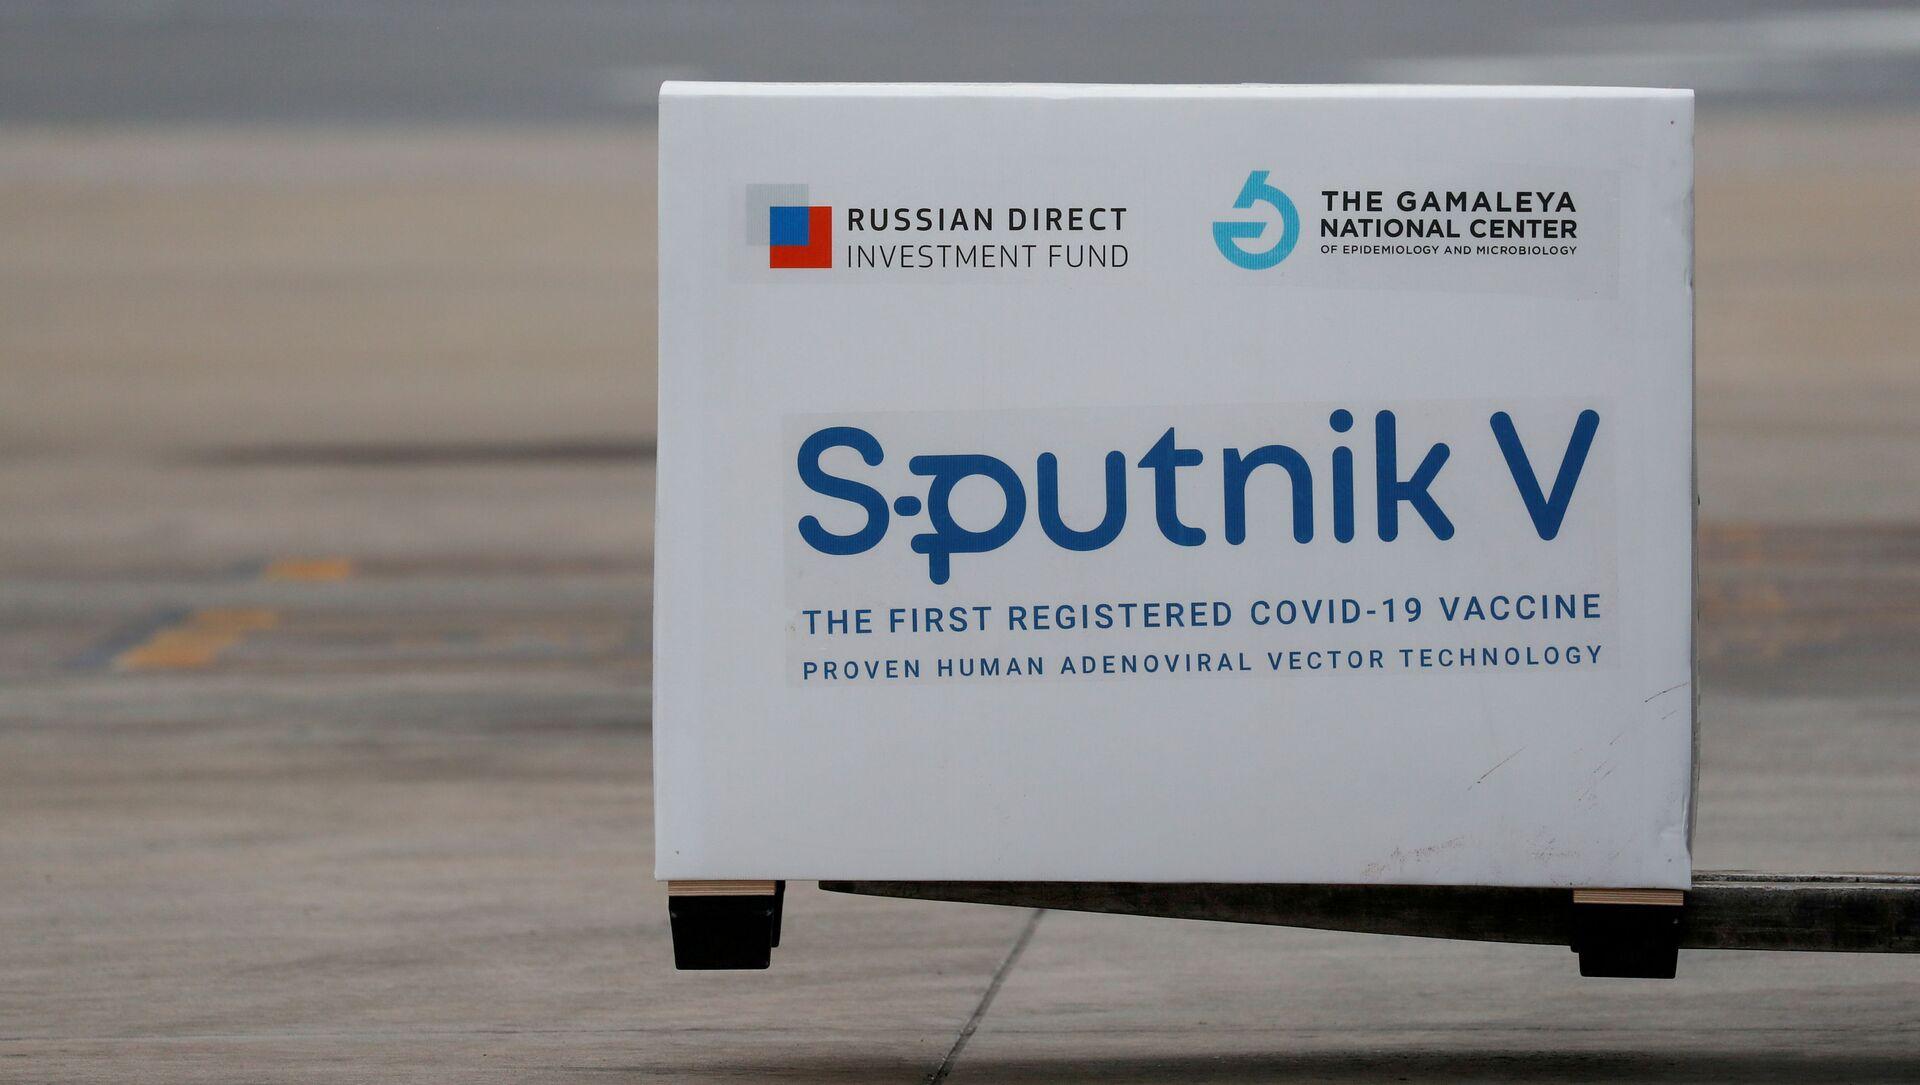 A shipment of doses of the Sputnik V (Gam-COVID-Vac) vaccine against the coronavirus disease (COVID-19)  - Sputnik International, 1920, 23.07.2021